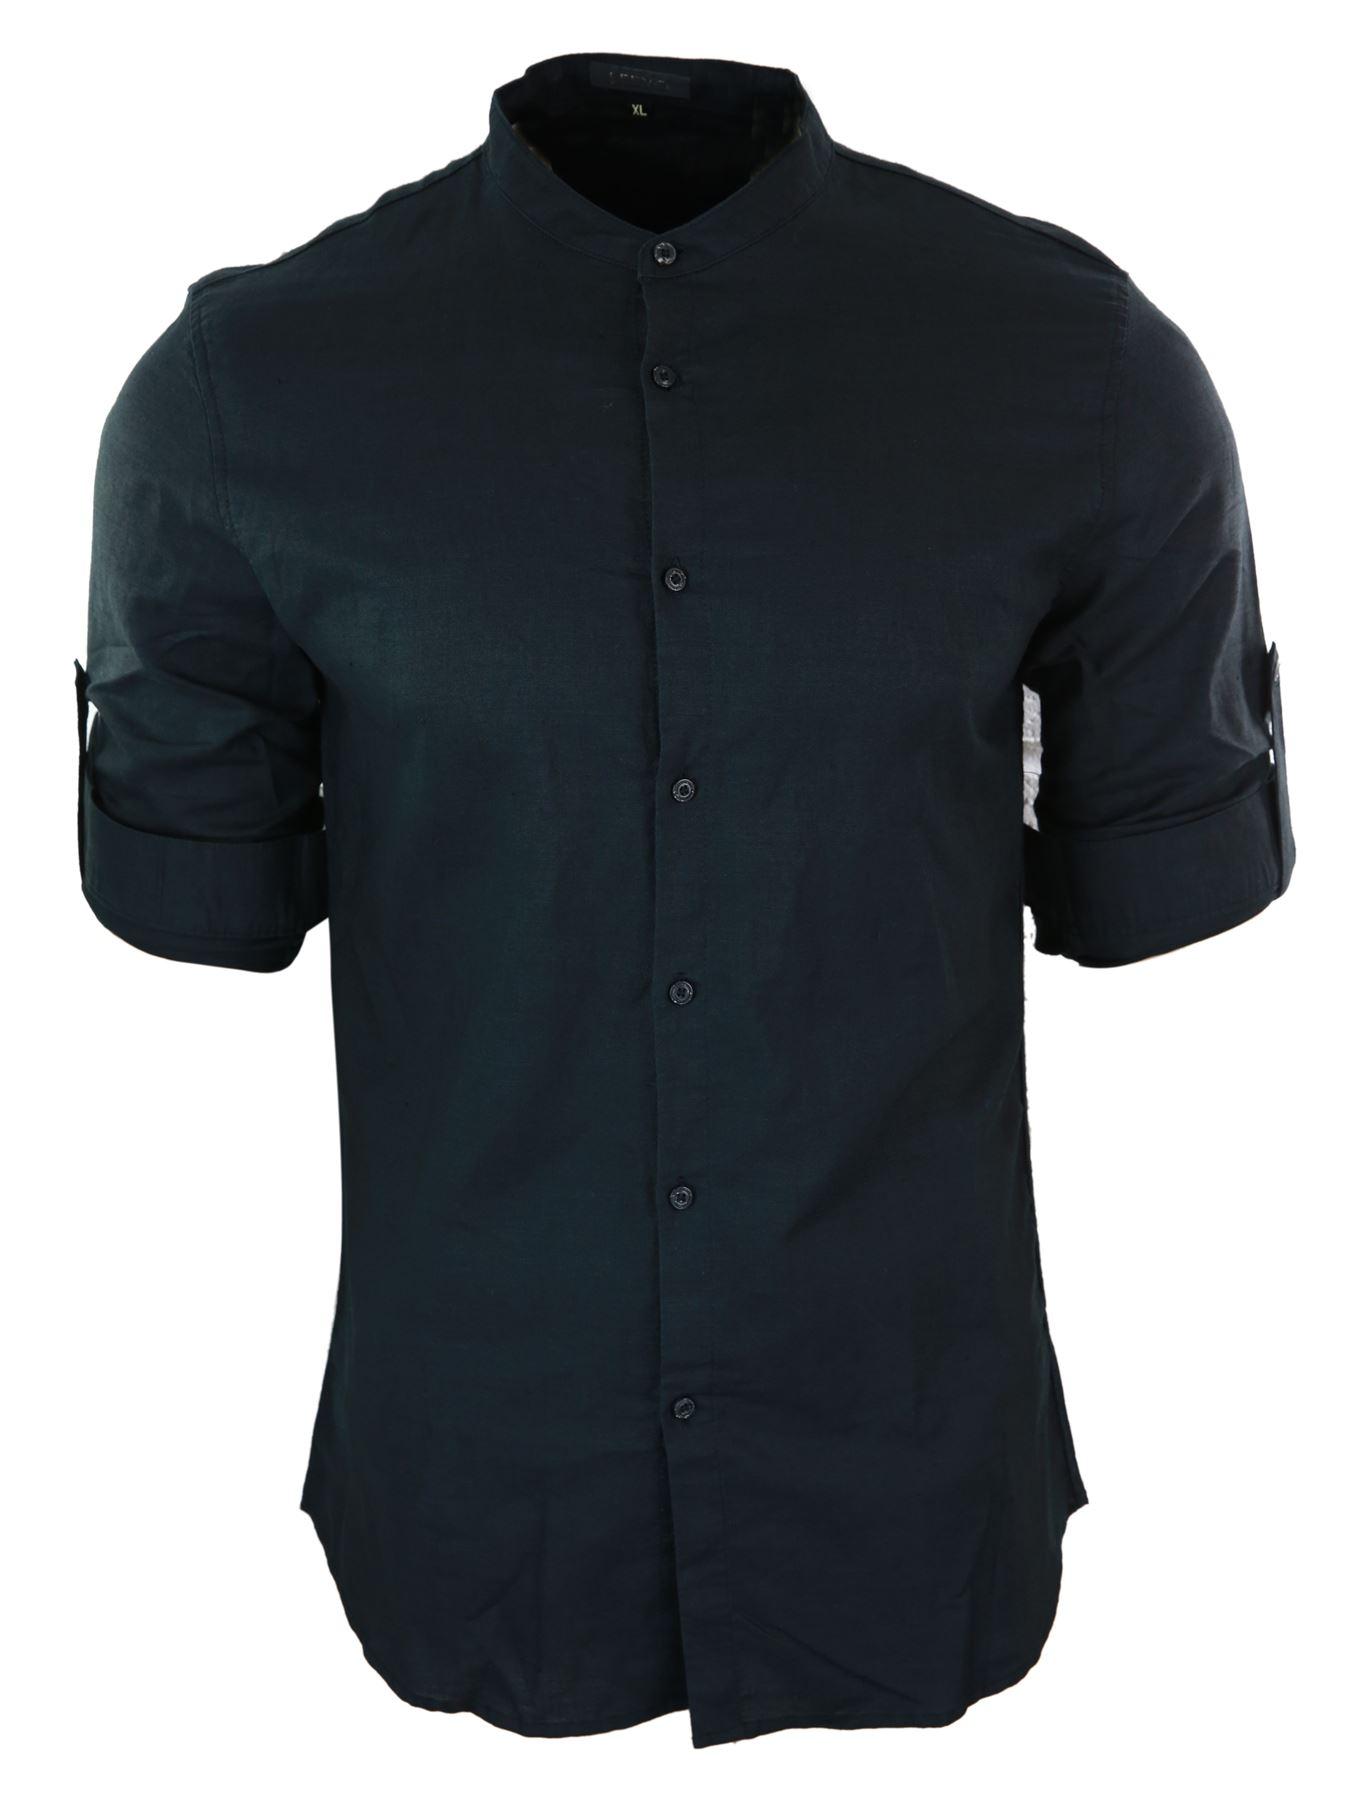 chemise homme col rond style indien en lin coupe slim manches longues a rouler ebay. Black Bedroom Furniture Sets. Home Design Ideas